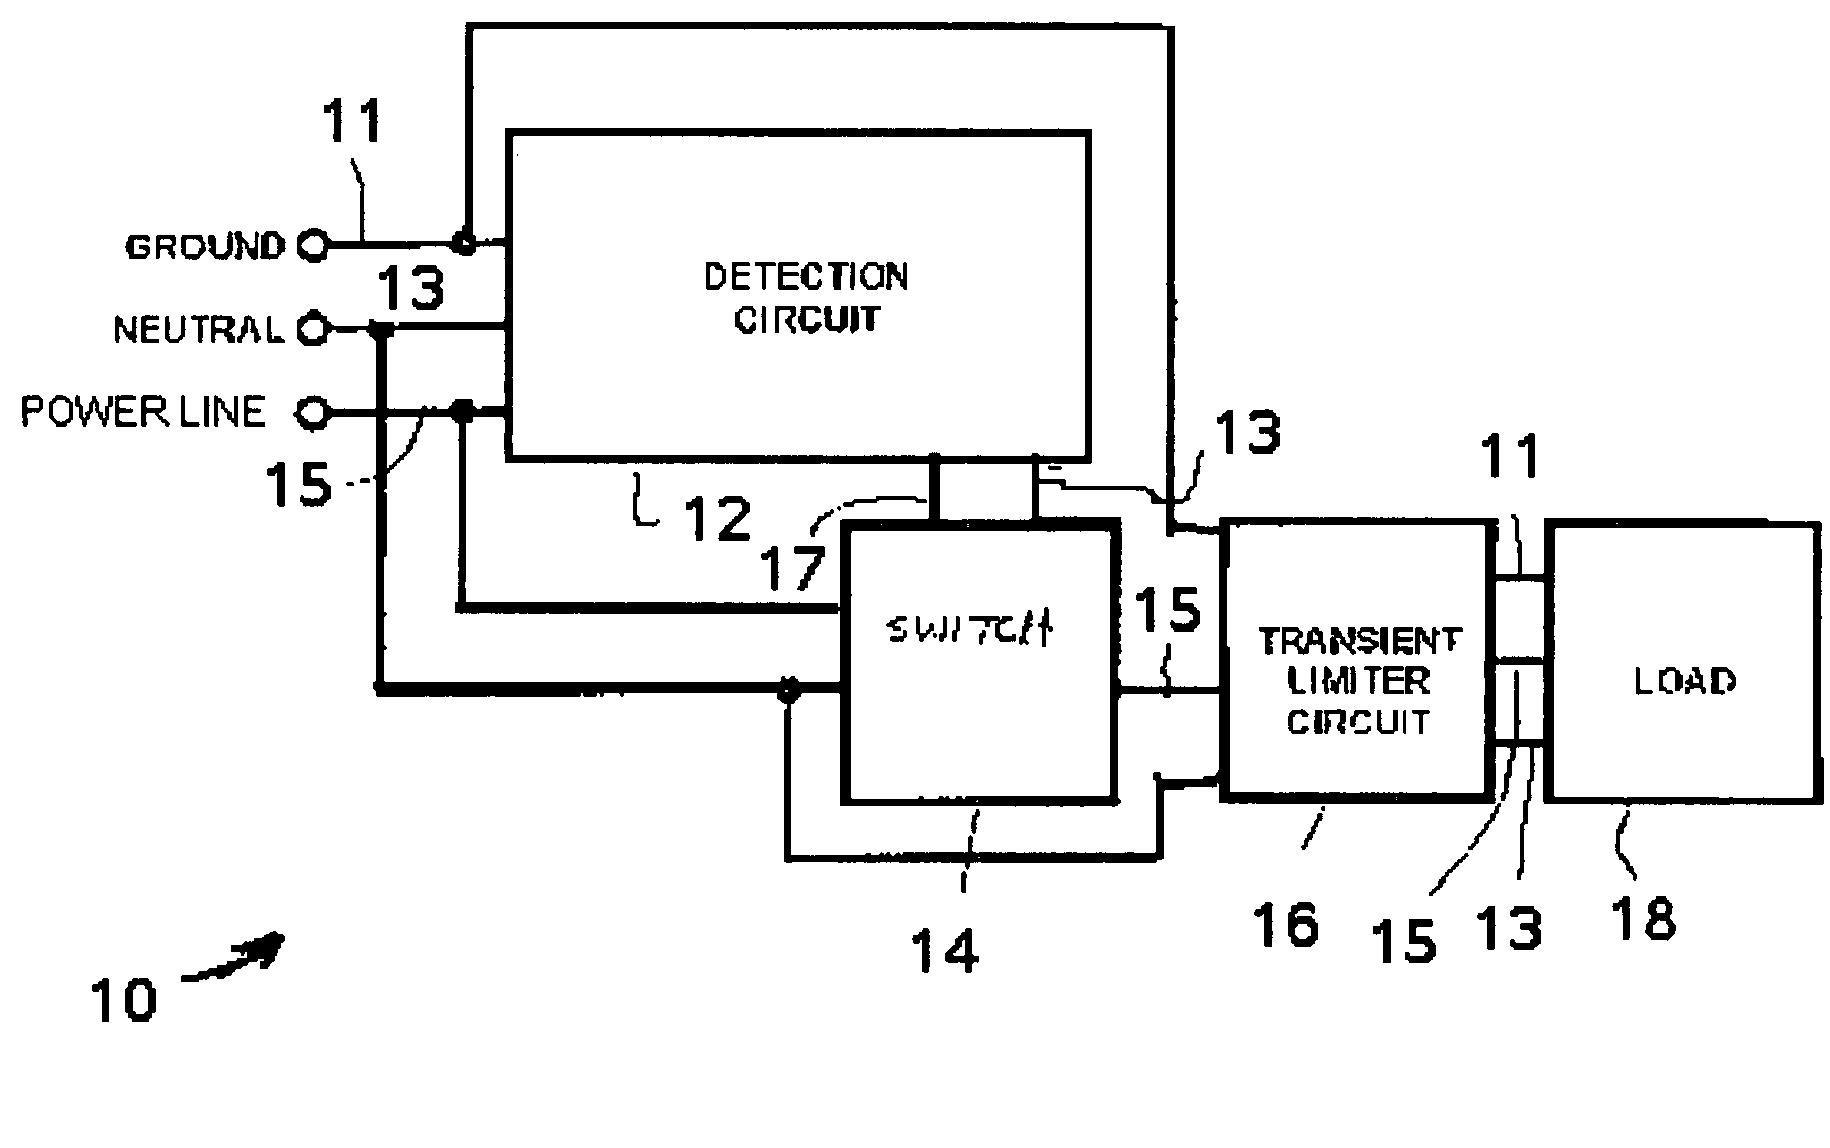 Wiring Diagram: 10 Elevator Shunt Trip Wiring Diagram